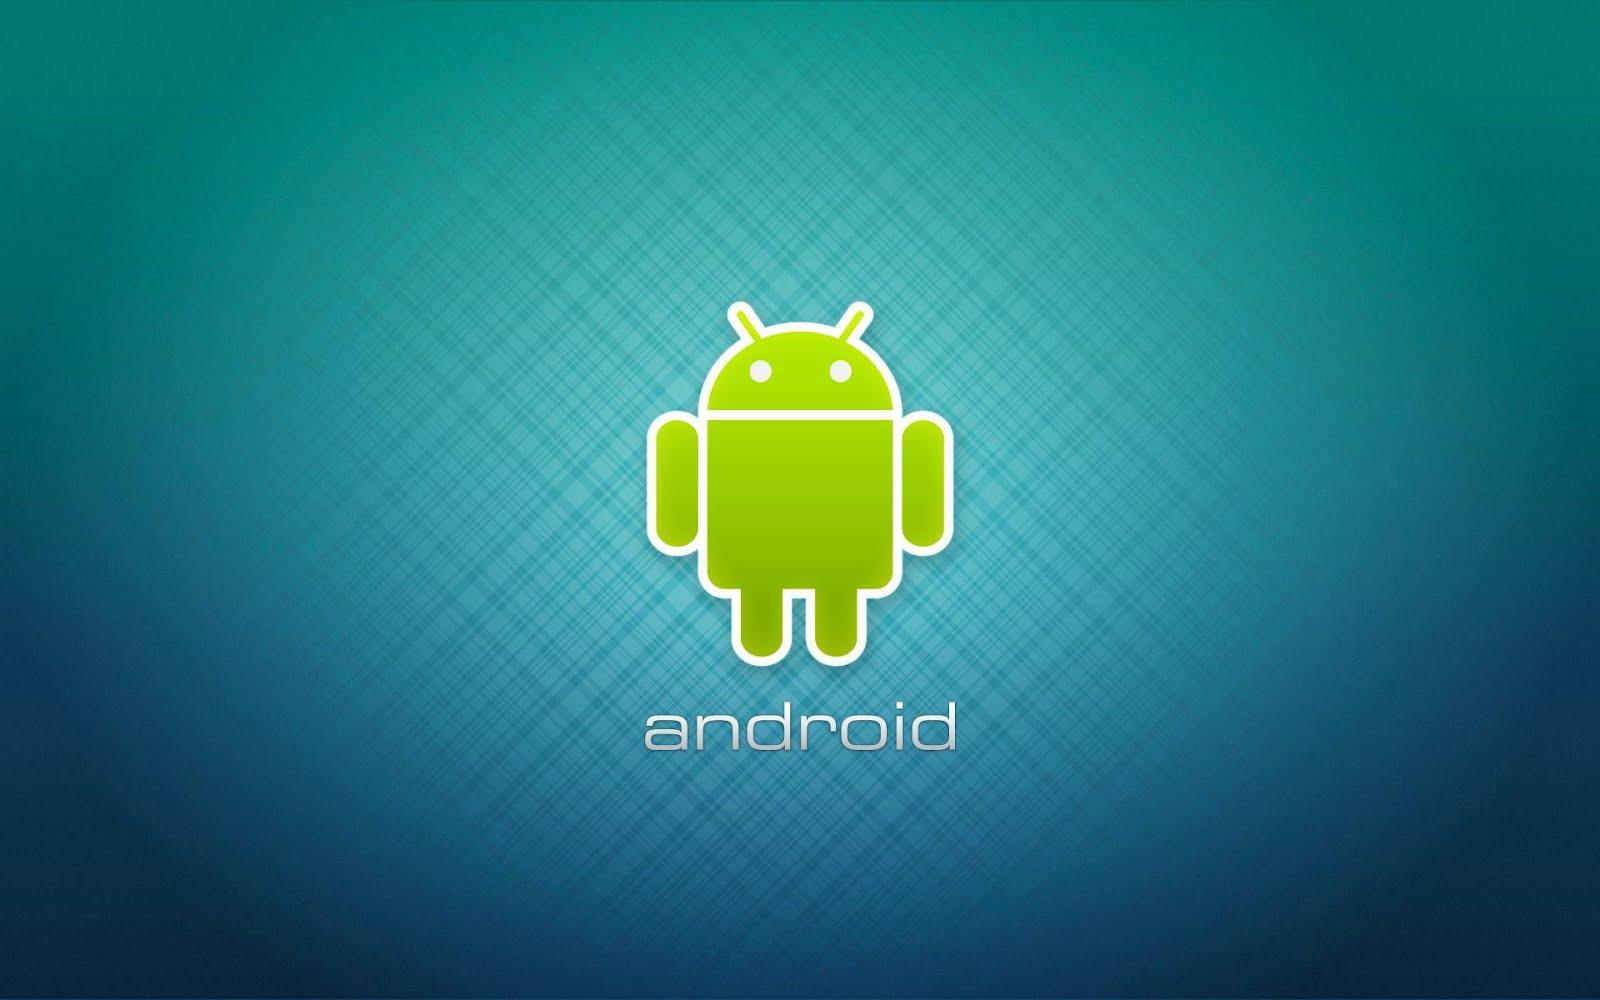 http://4.bp.blogspot.com/-_OU2PWsOhFM/UENGy0S7mNI/AAAAAAAAAic/GAG0Ea6Kg4I/s1600/android%2Bwallpaper%2B3.jpg